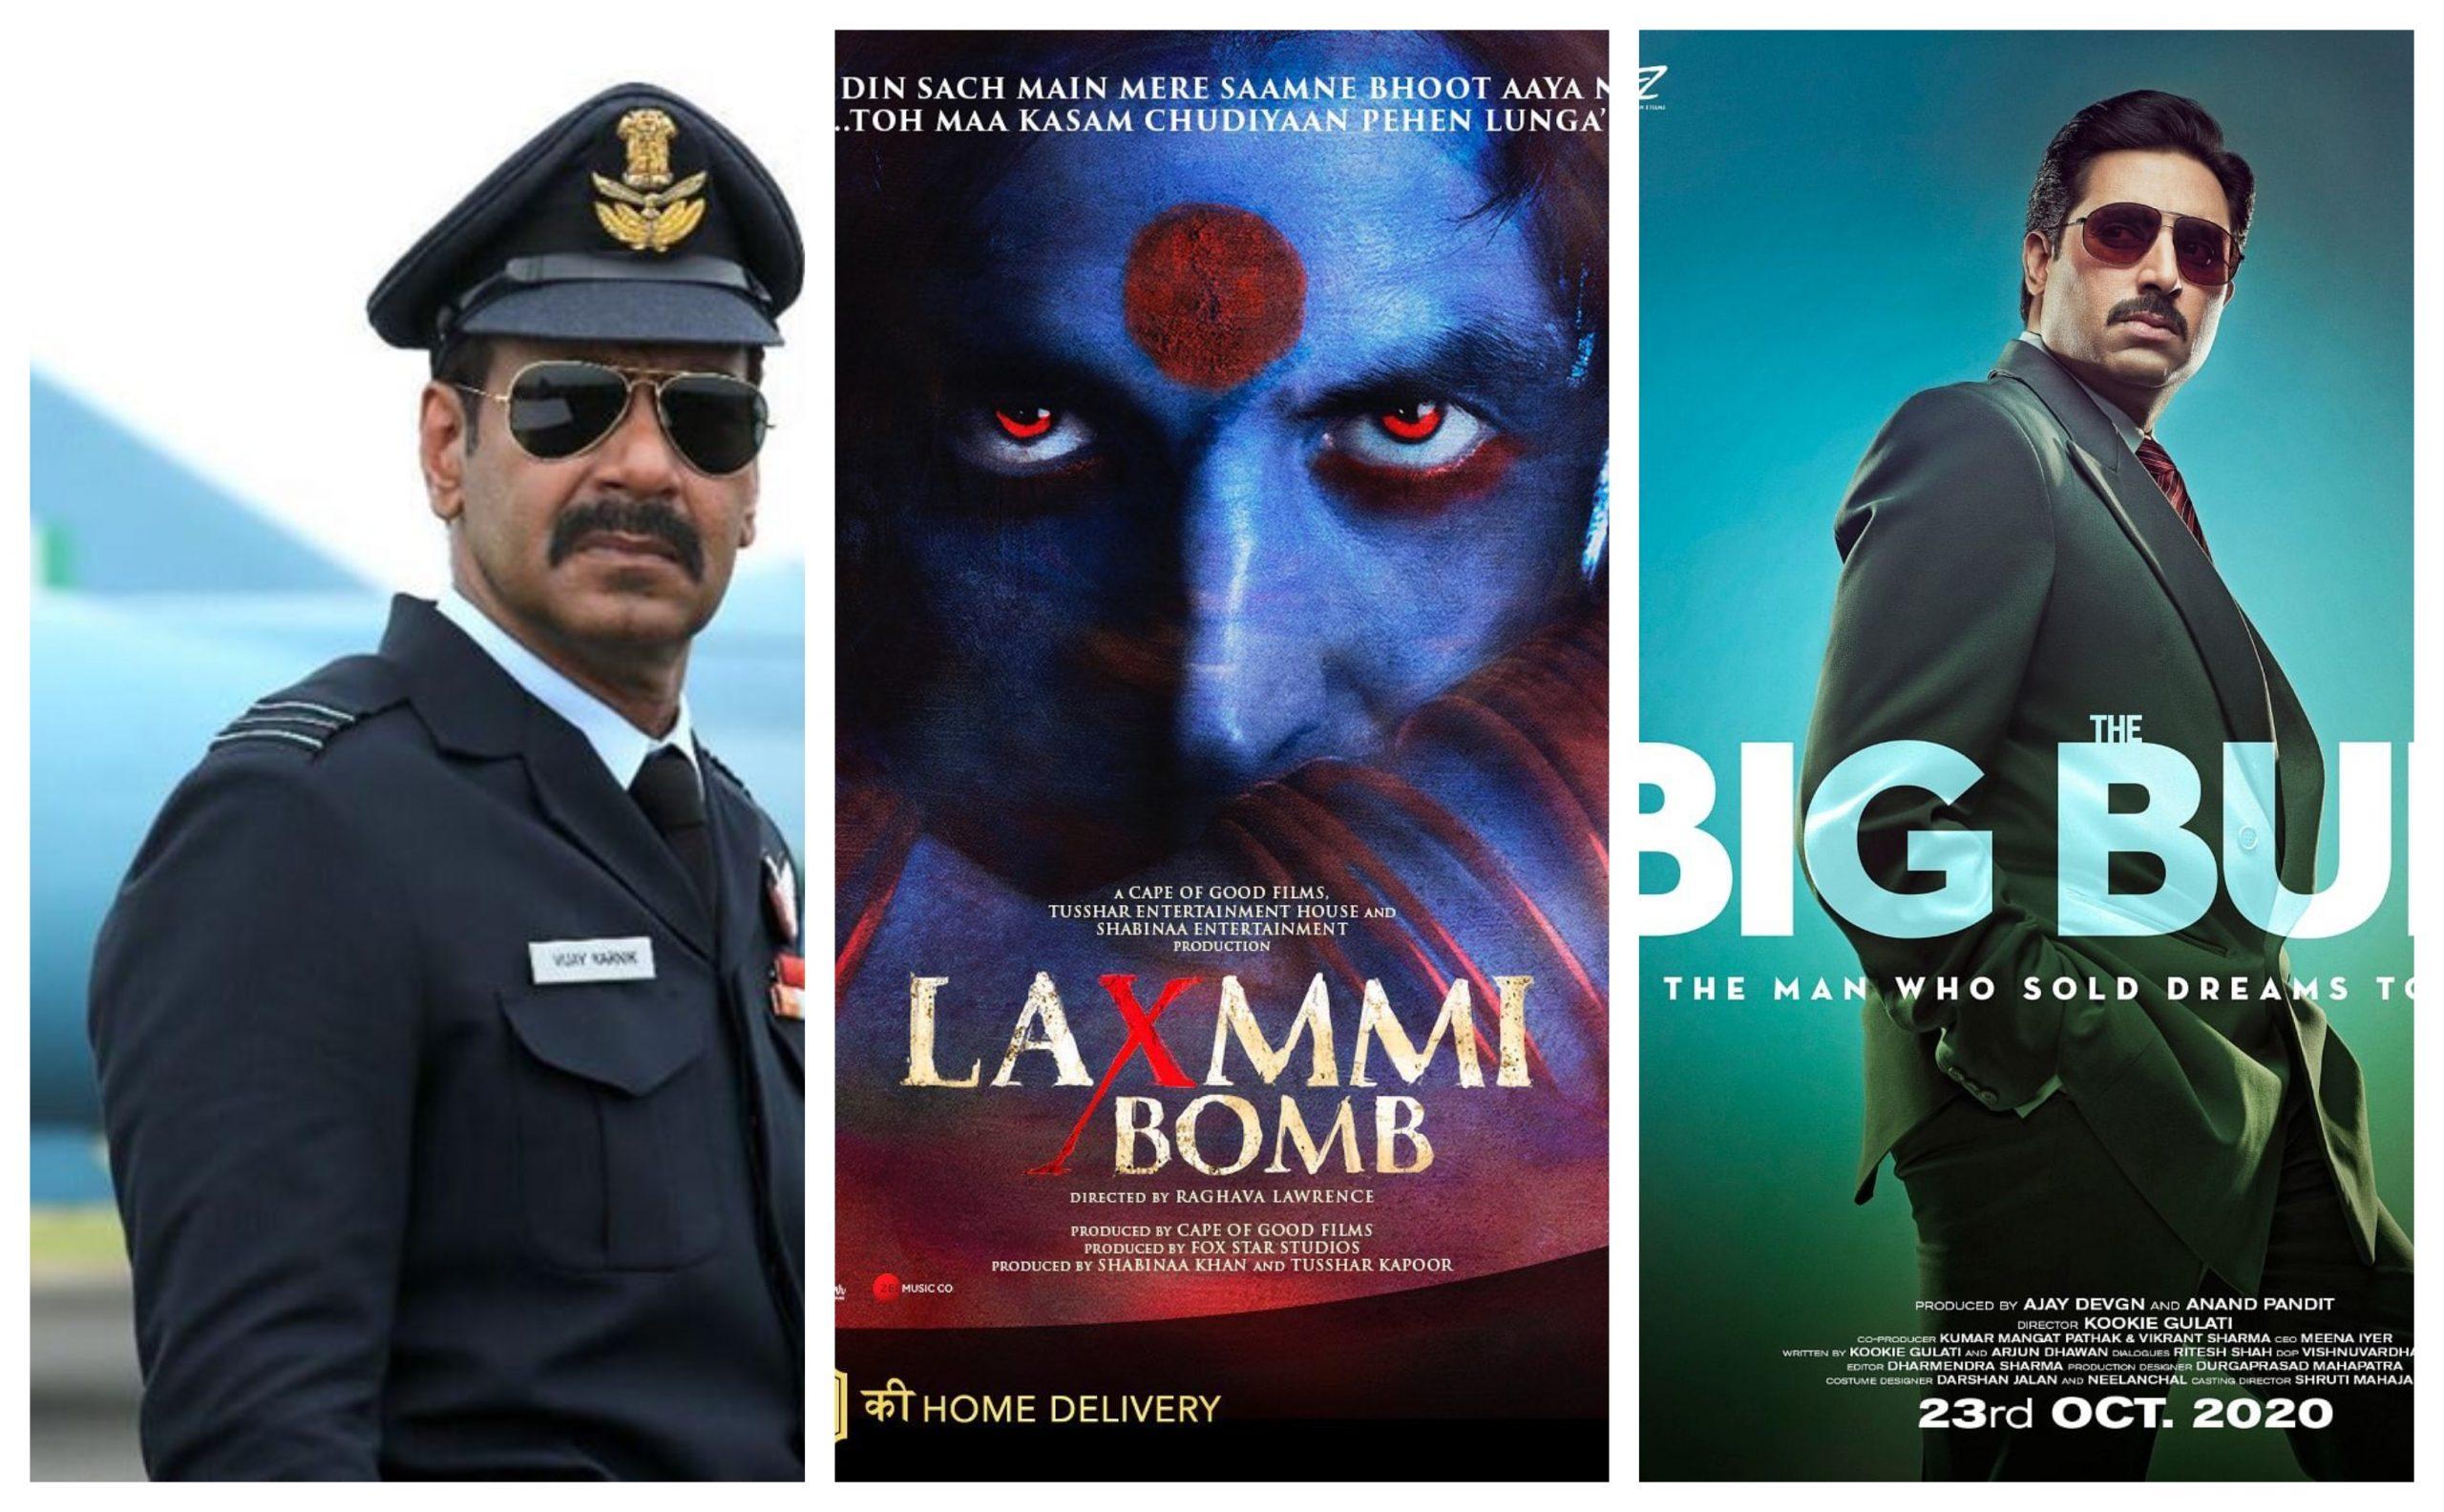 Bhuj, Laxmmi Bomb and The Big Bull Posters